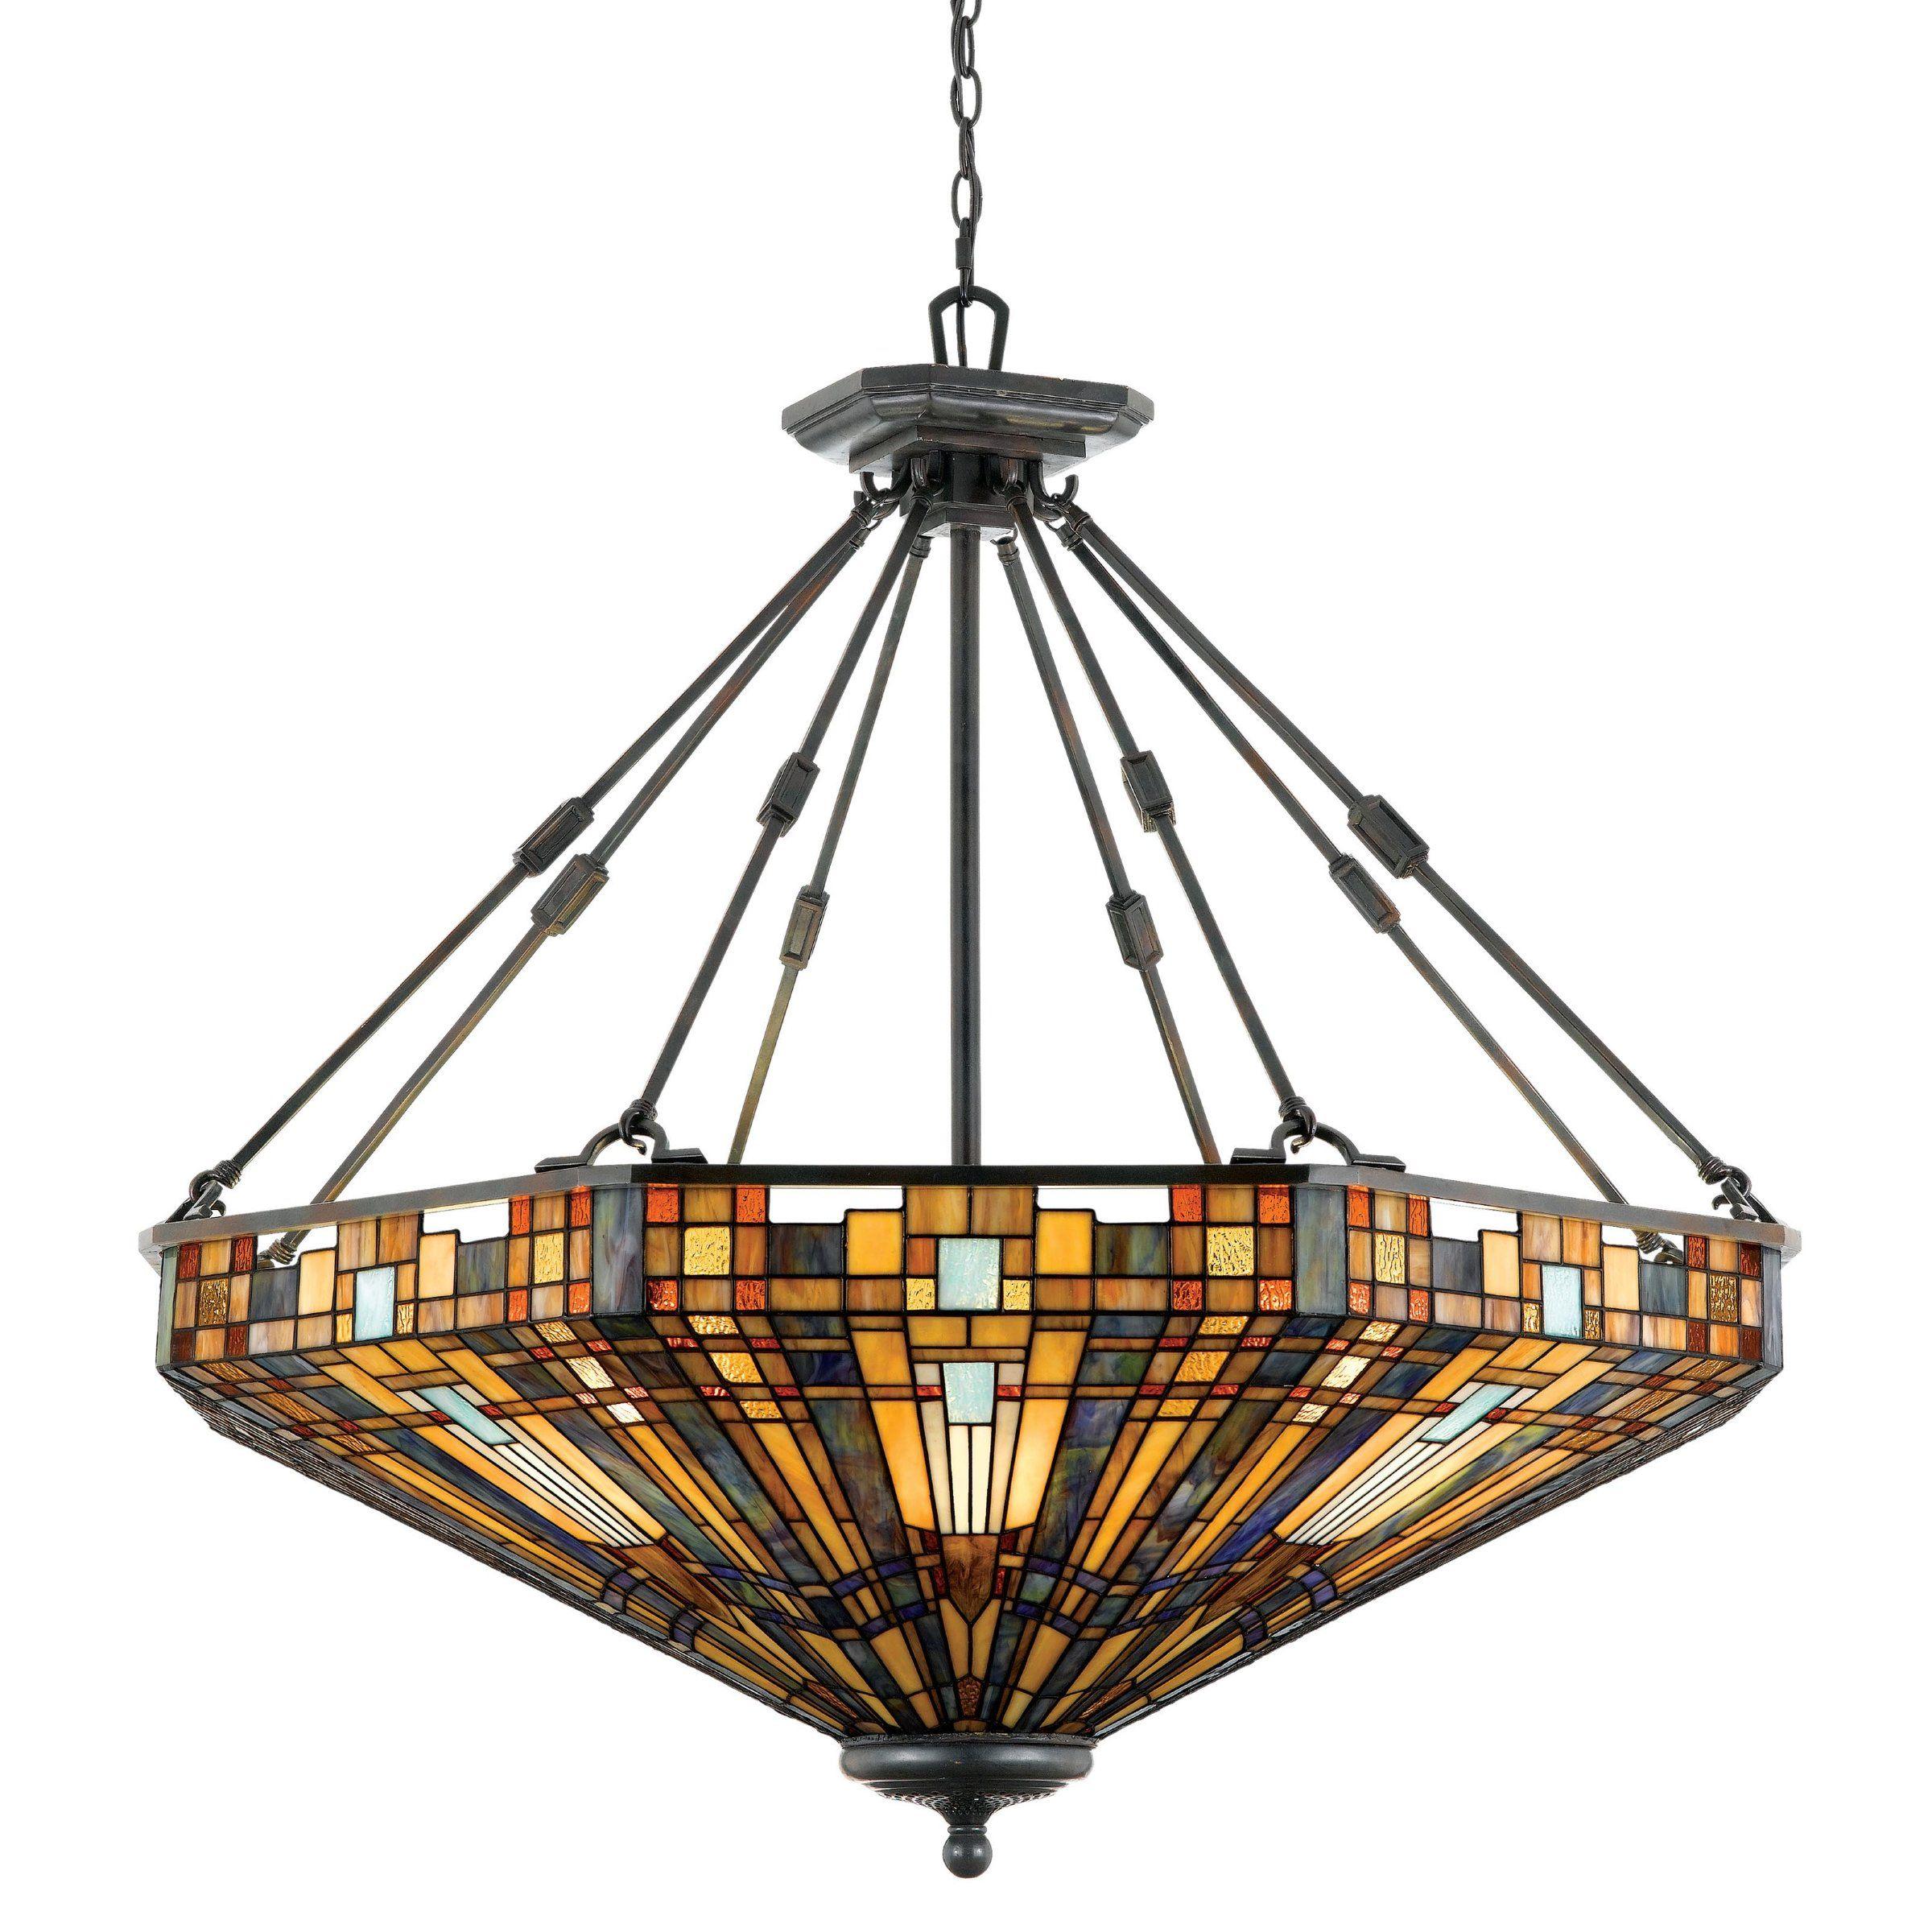 Quoizel Tfik2842va Inglenook Large Tiffany Pendant Pendant Lights At Hayneedle Victorian Lighting Pendant Light Fixtures Tiffany Chandelier Dining Room